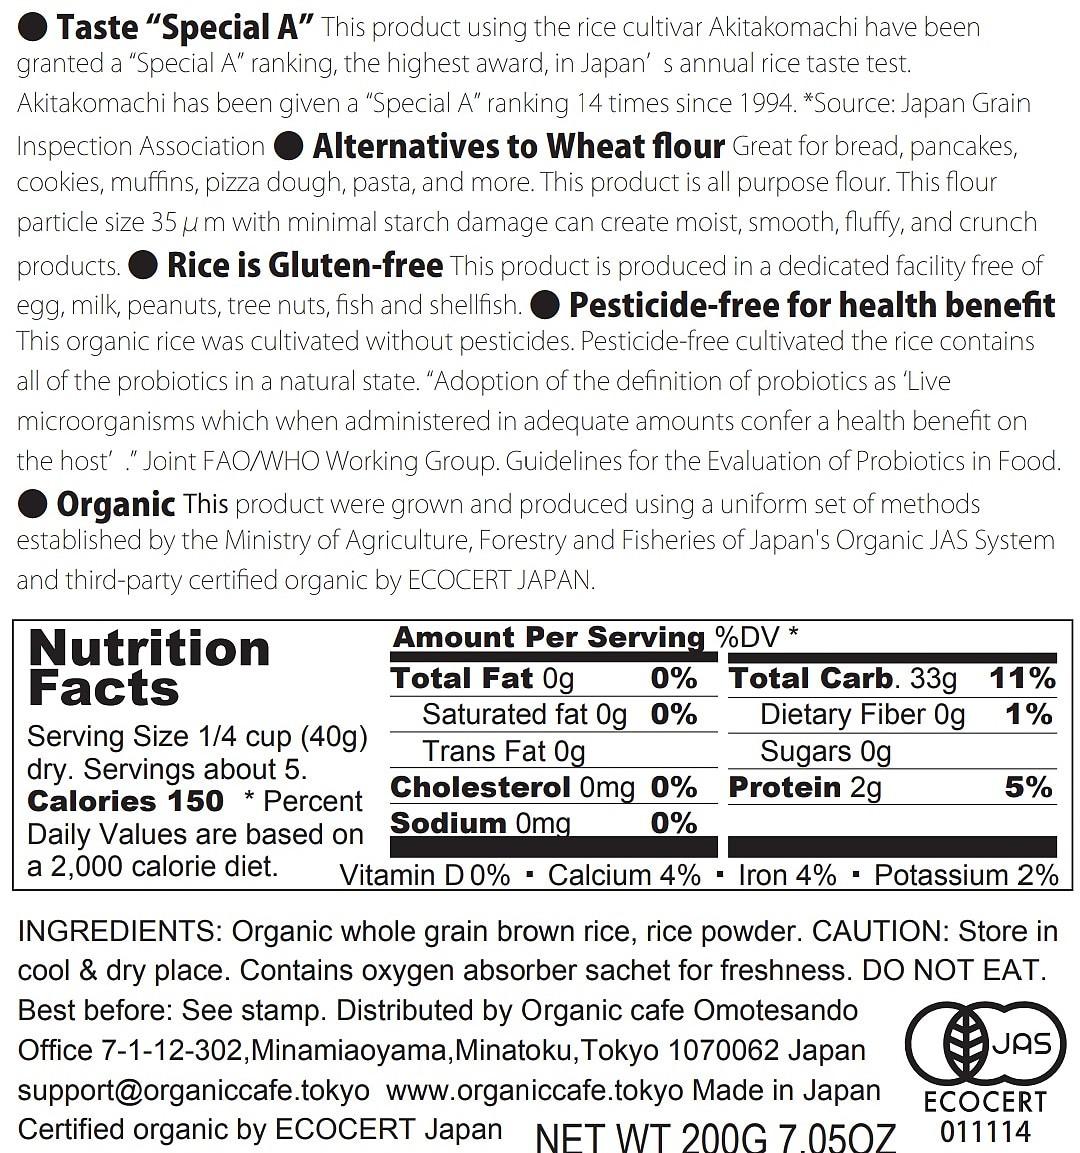 Organic rice flour label 有機米粉のラベル